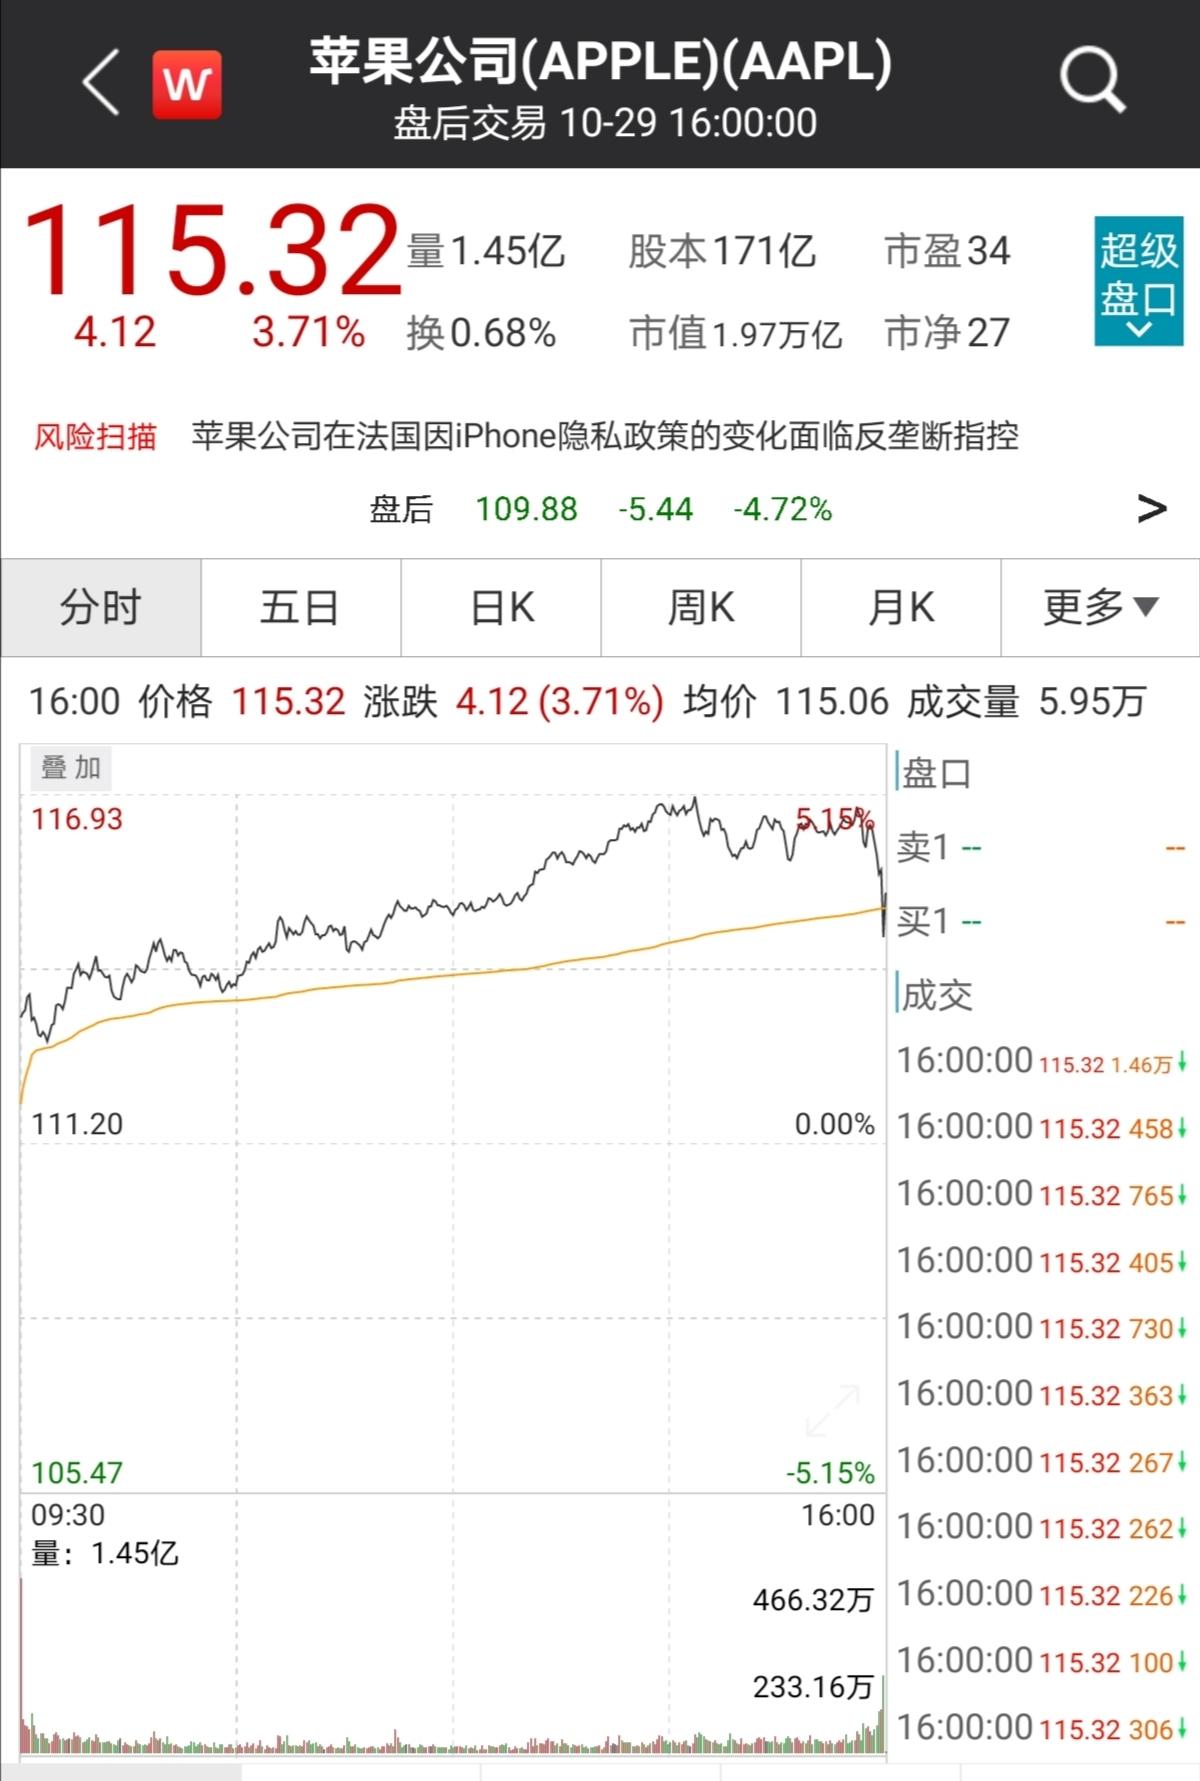 iPhone销售额降20%,大中华区营收大降28%!苹果发布新财报后,股价应声转跌...